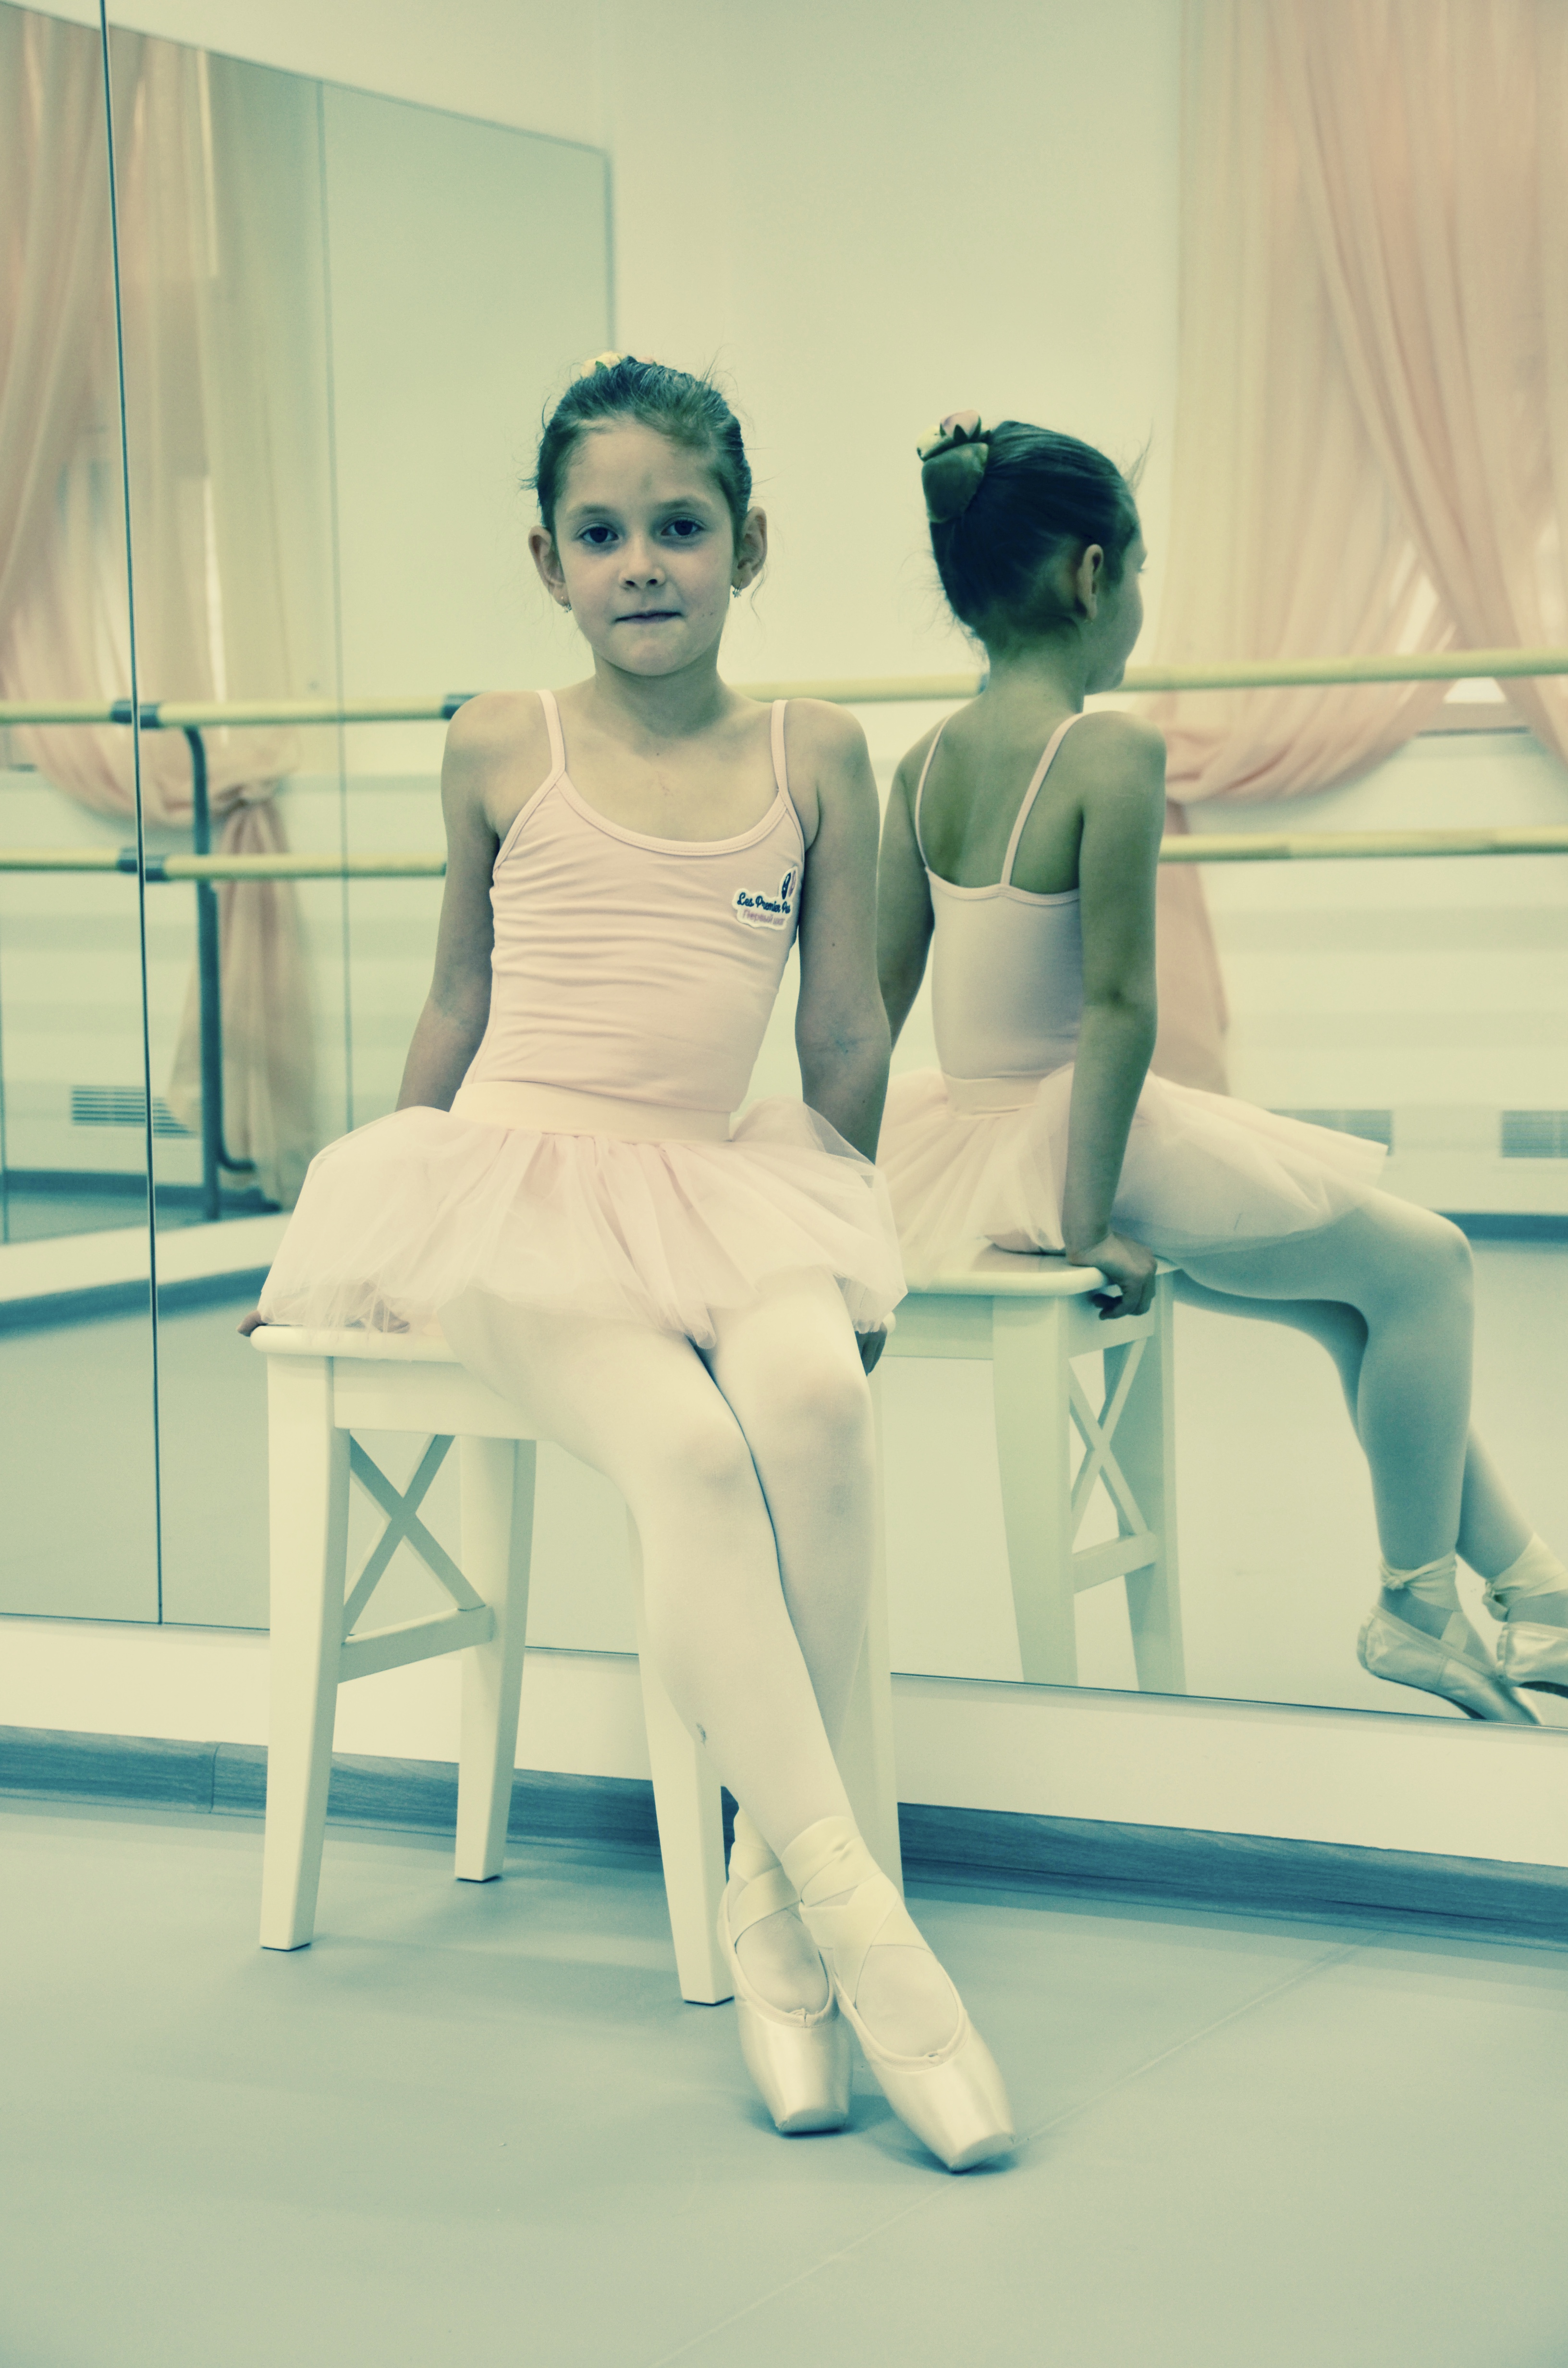 Юная балерина в пуантах